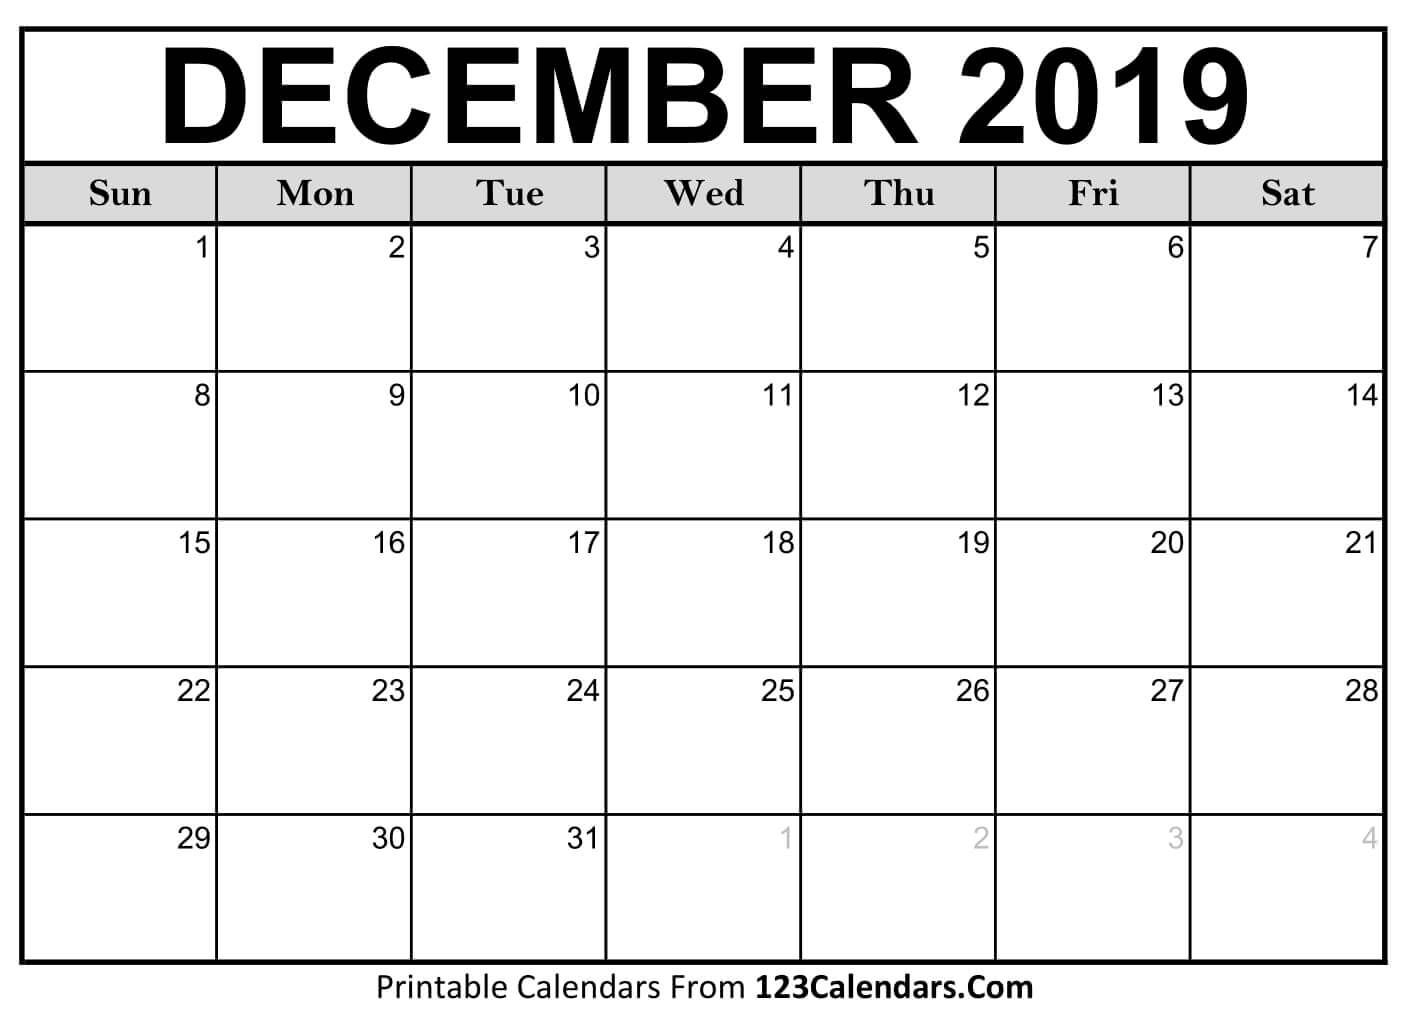 Printable December 2019 Calendar Templates - 123Calendars